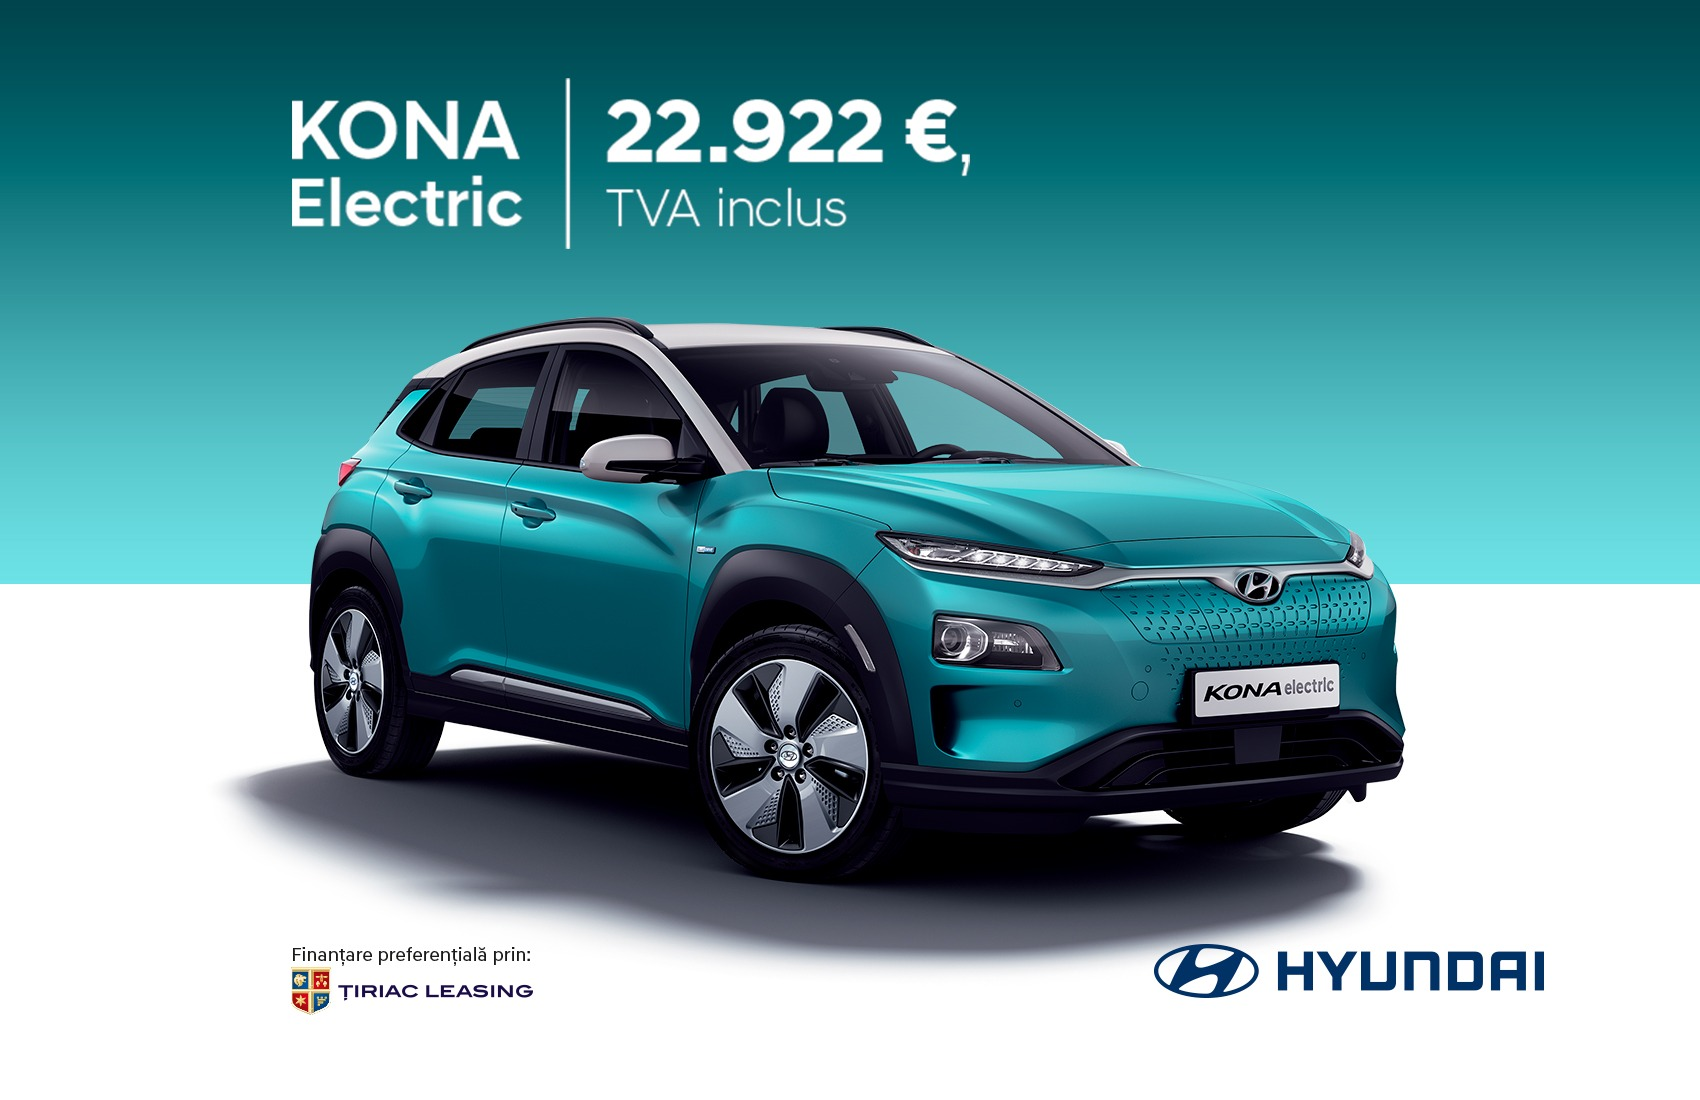 KONA ELECTRIC - 22.922 €, TVA inclus prin Programul REMAT